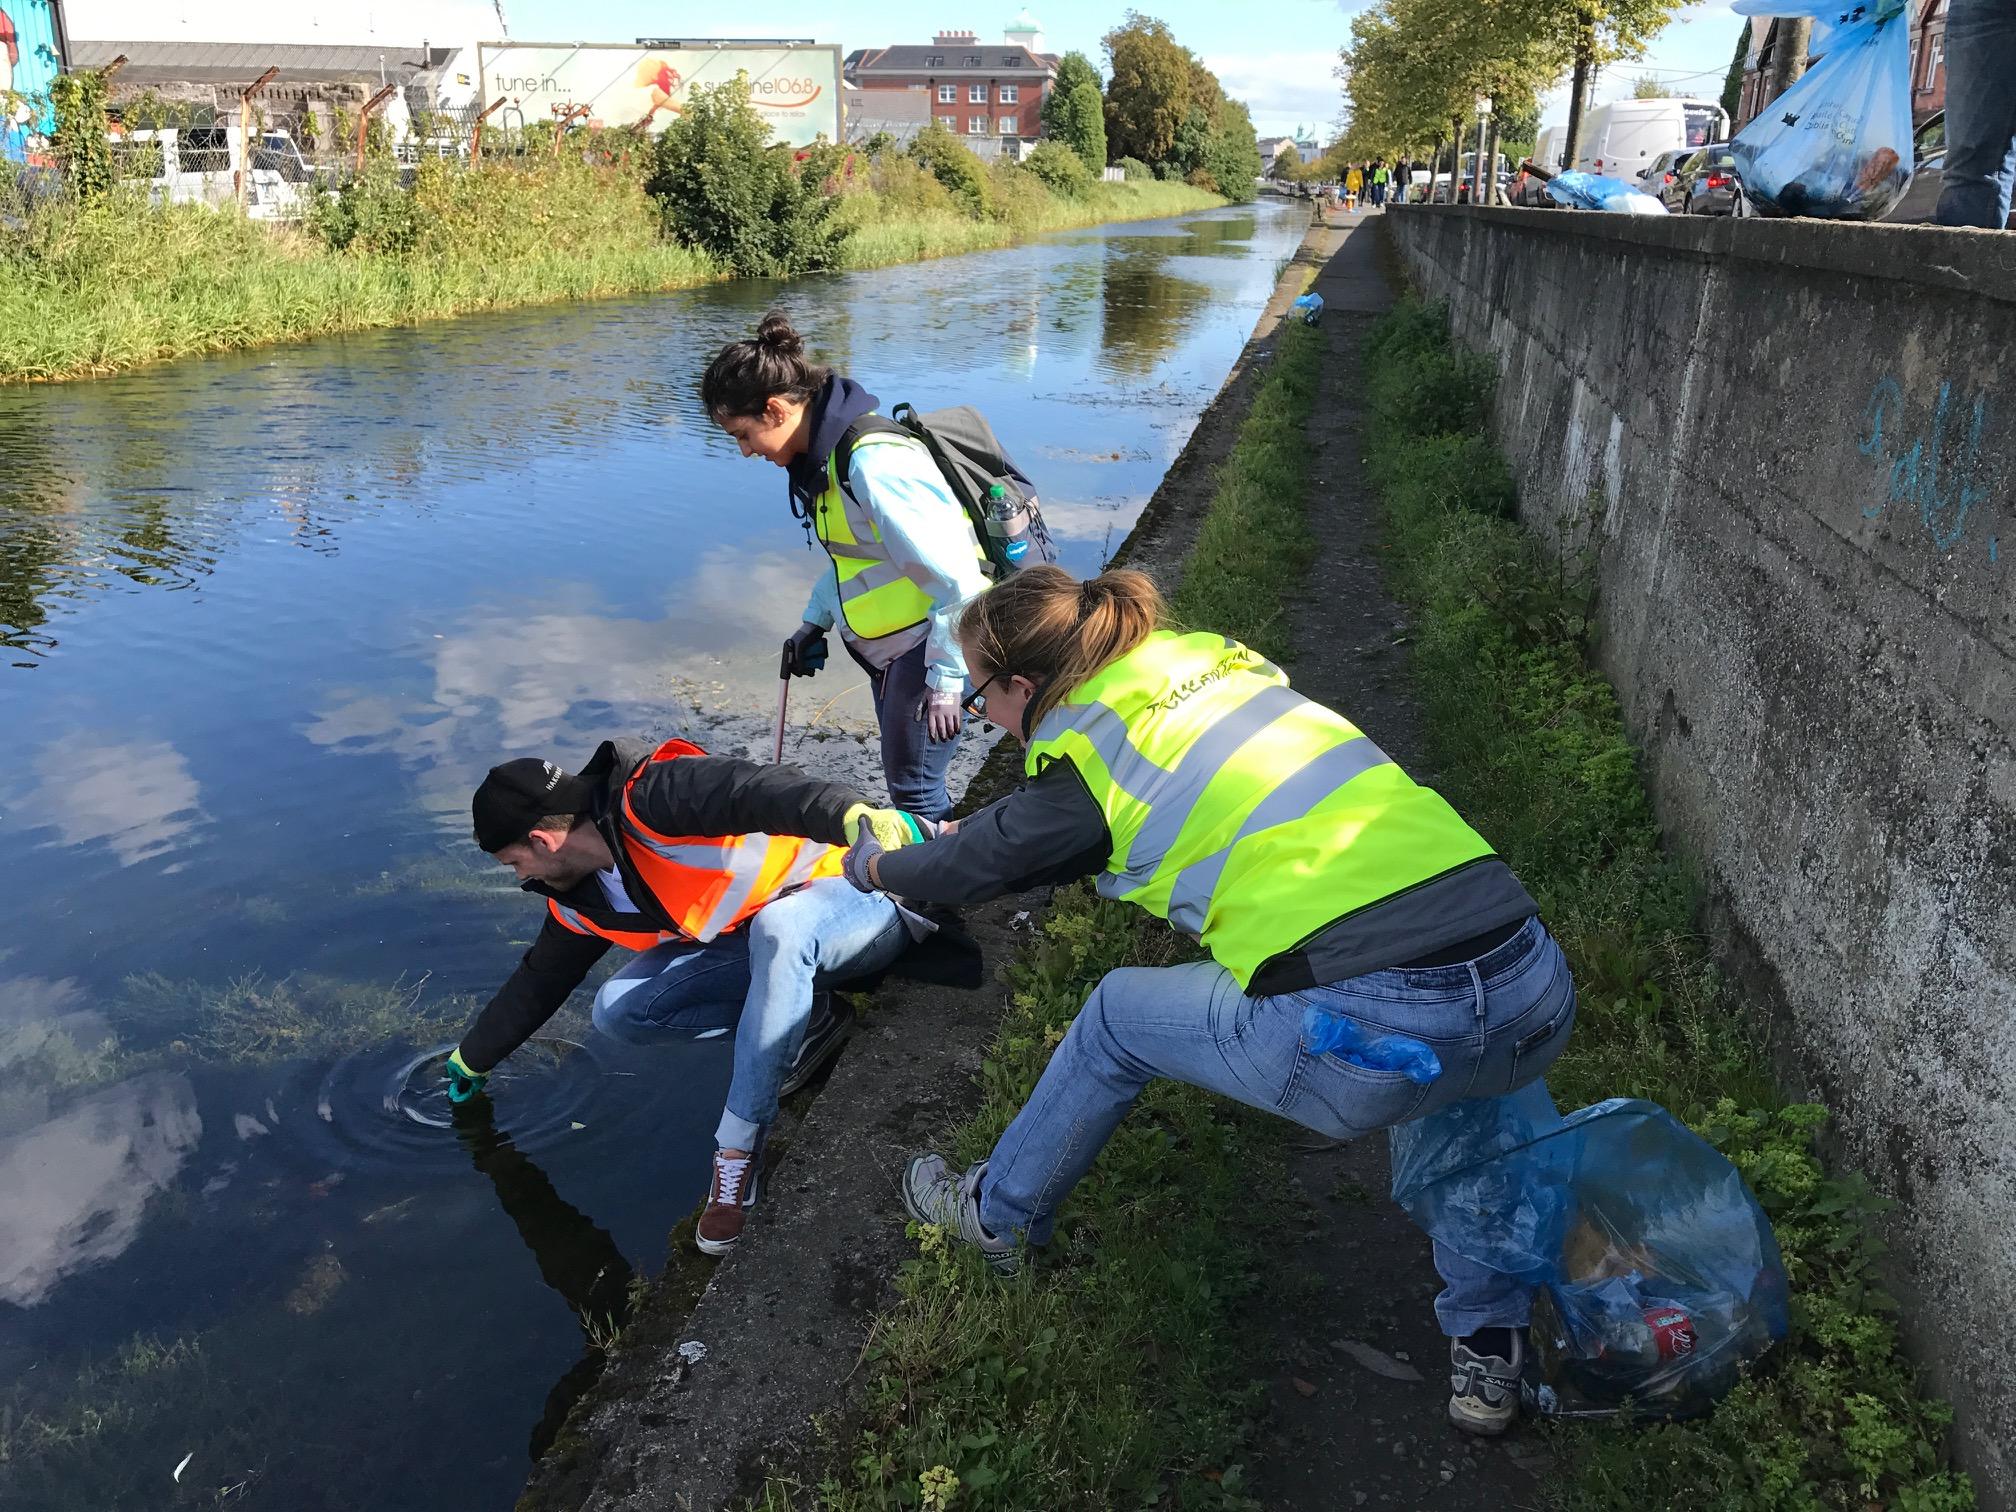 canal clean up - CSR program Dublin